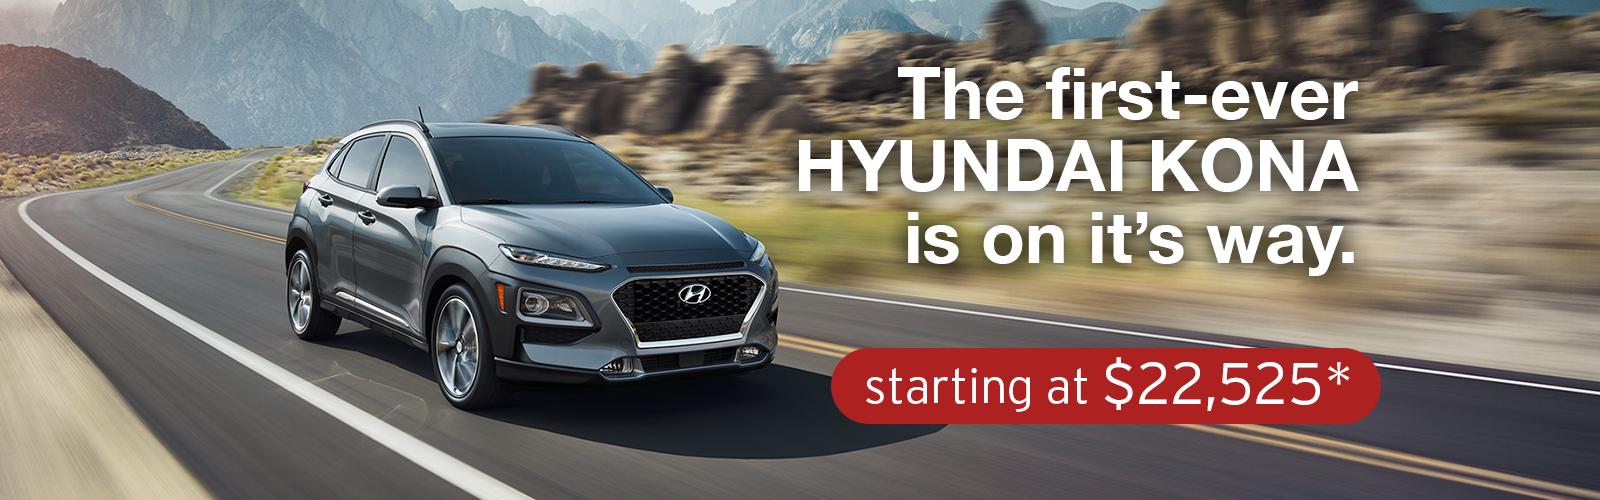 2018 Hyundai Kona Arriving Soon